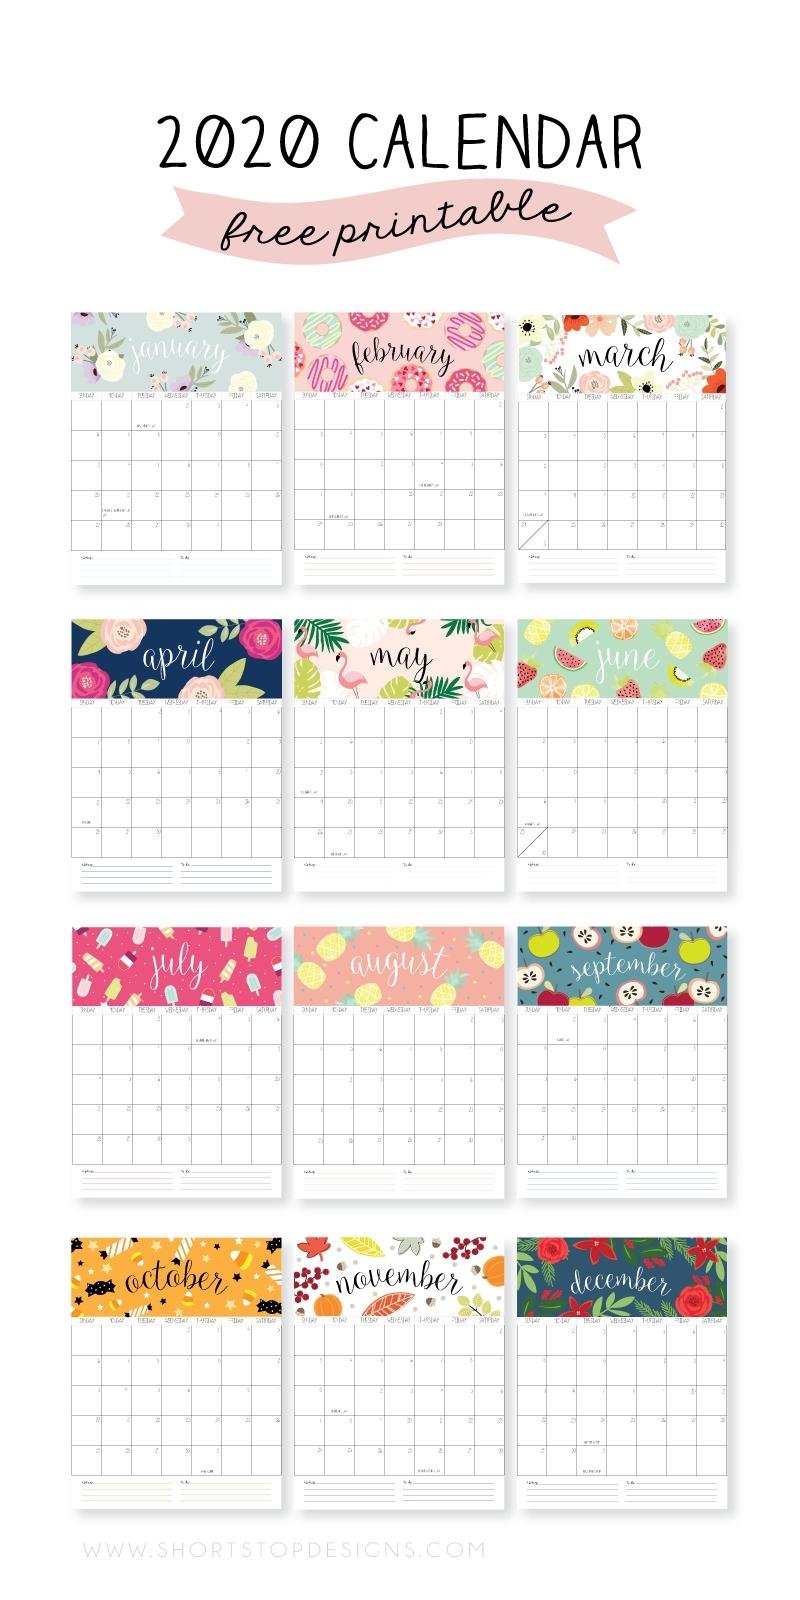 2020 Printable Calendar - Short Stop Designs